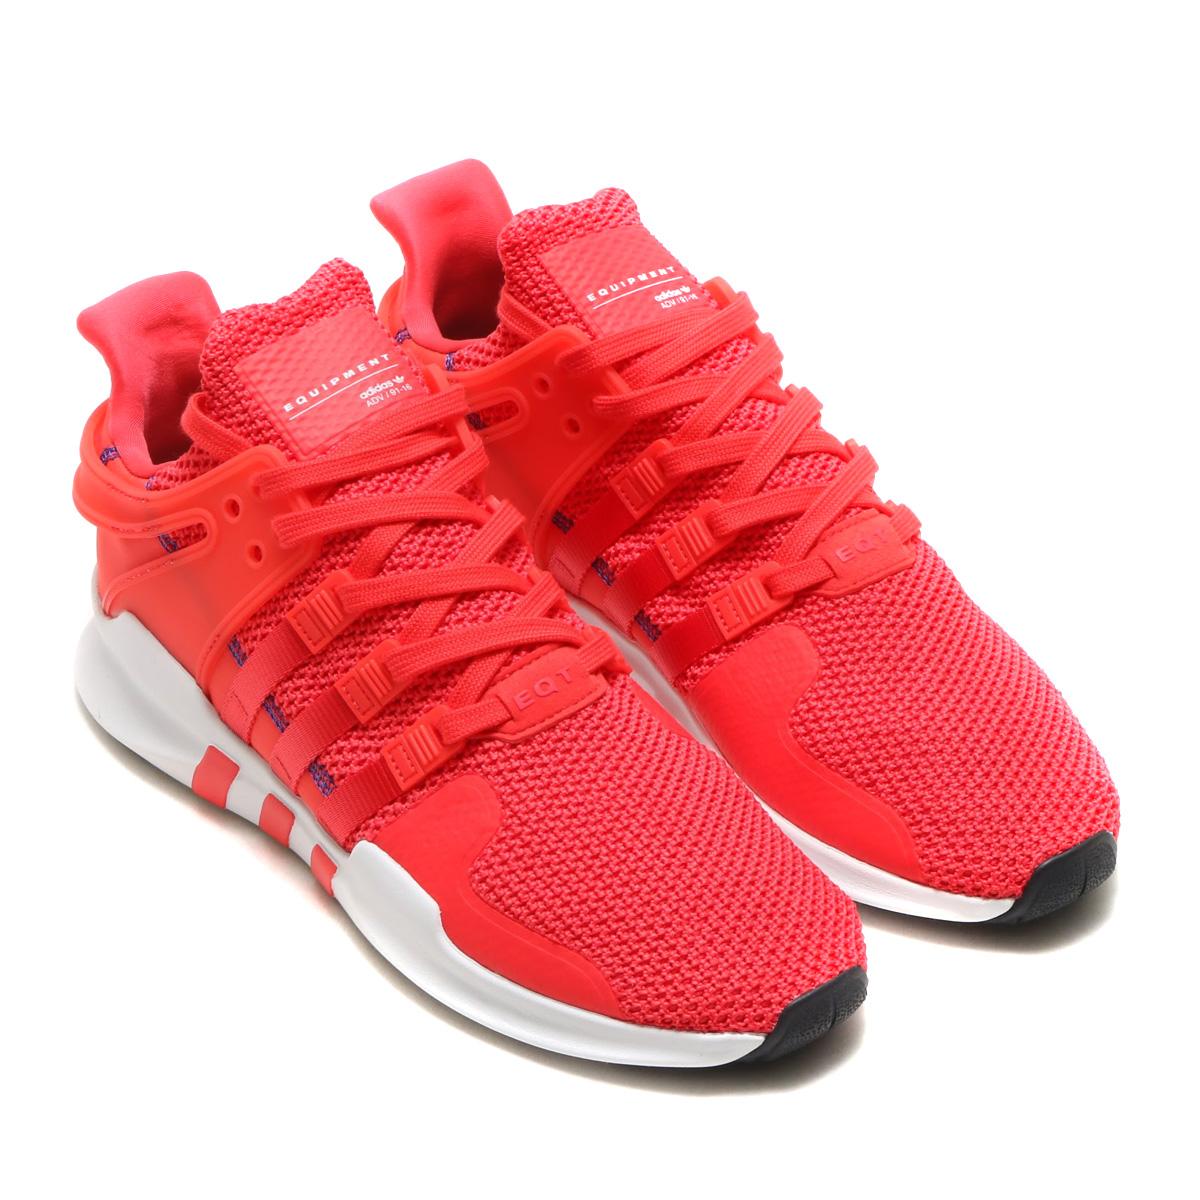 adidas Originals EQT SUPPORT ADV(アディダス オリジナルス イーキューティー サポート ADV)real coral/real coral/ftwr white18SS-I